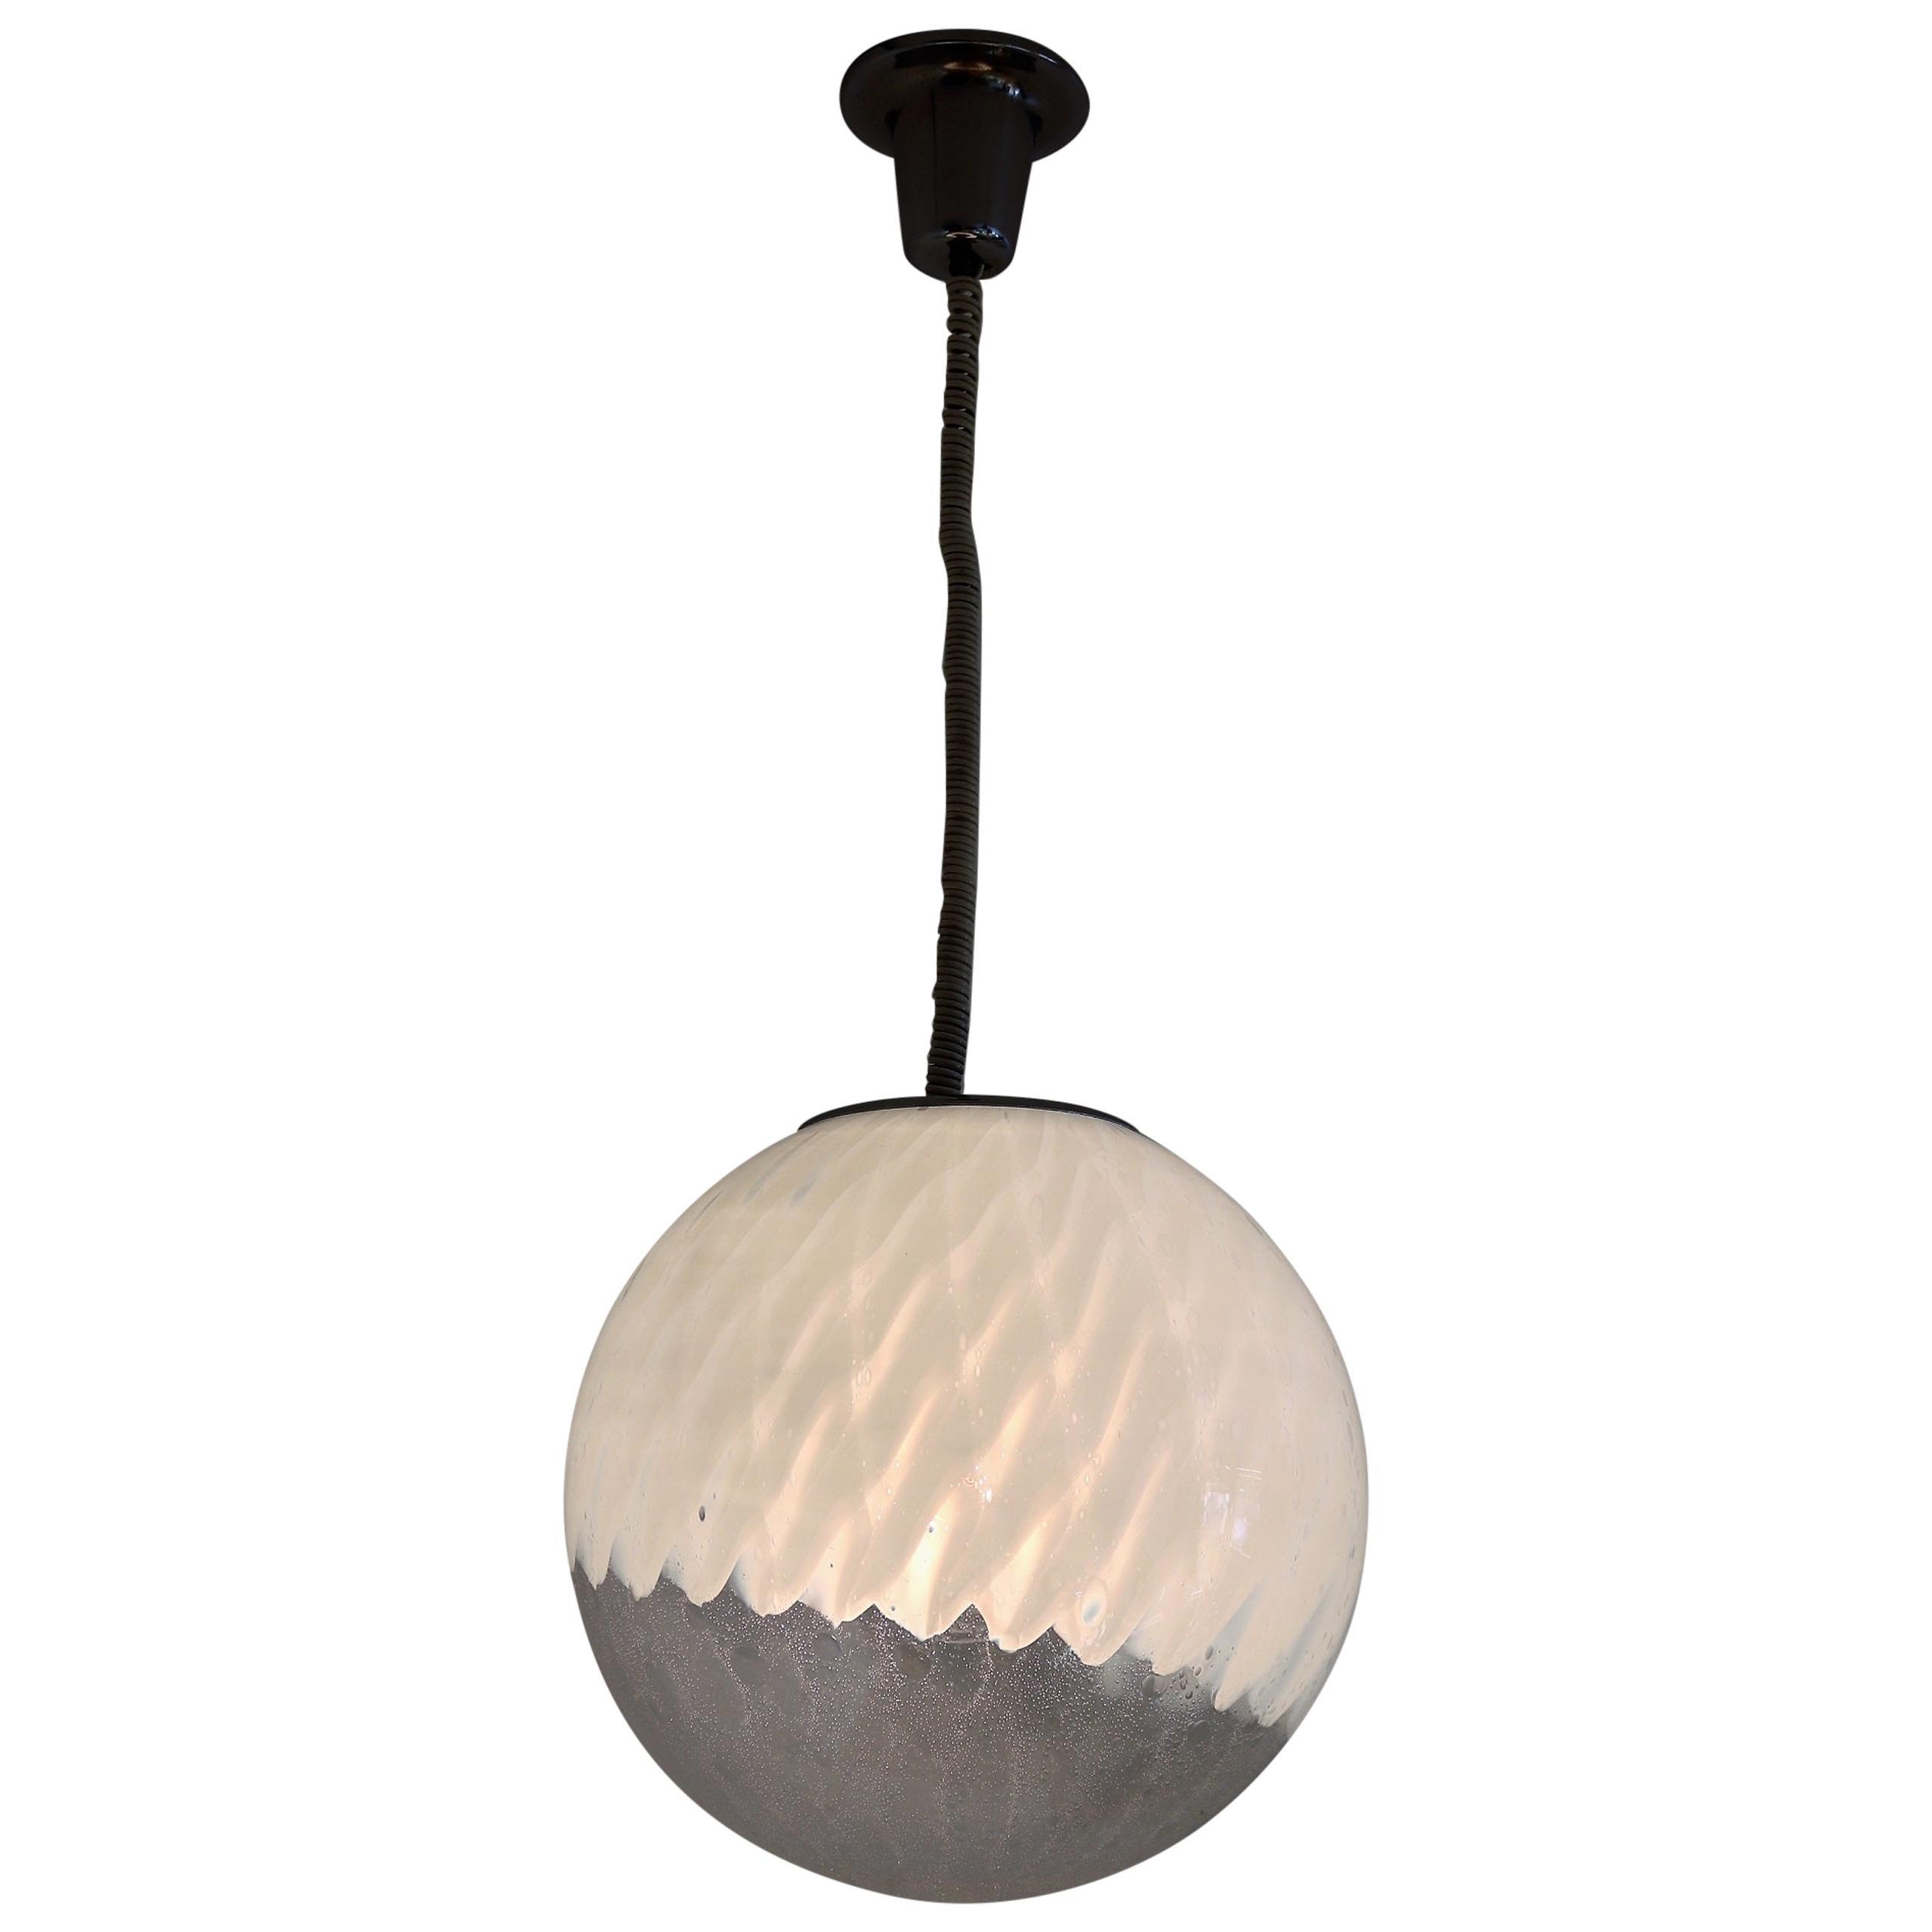 Italian Midcentury Murano Glass Globe Chandelier with Chrome Details, 1970s